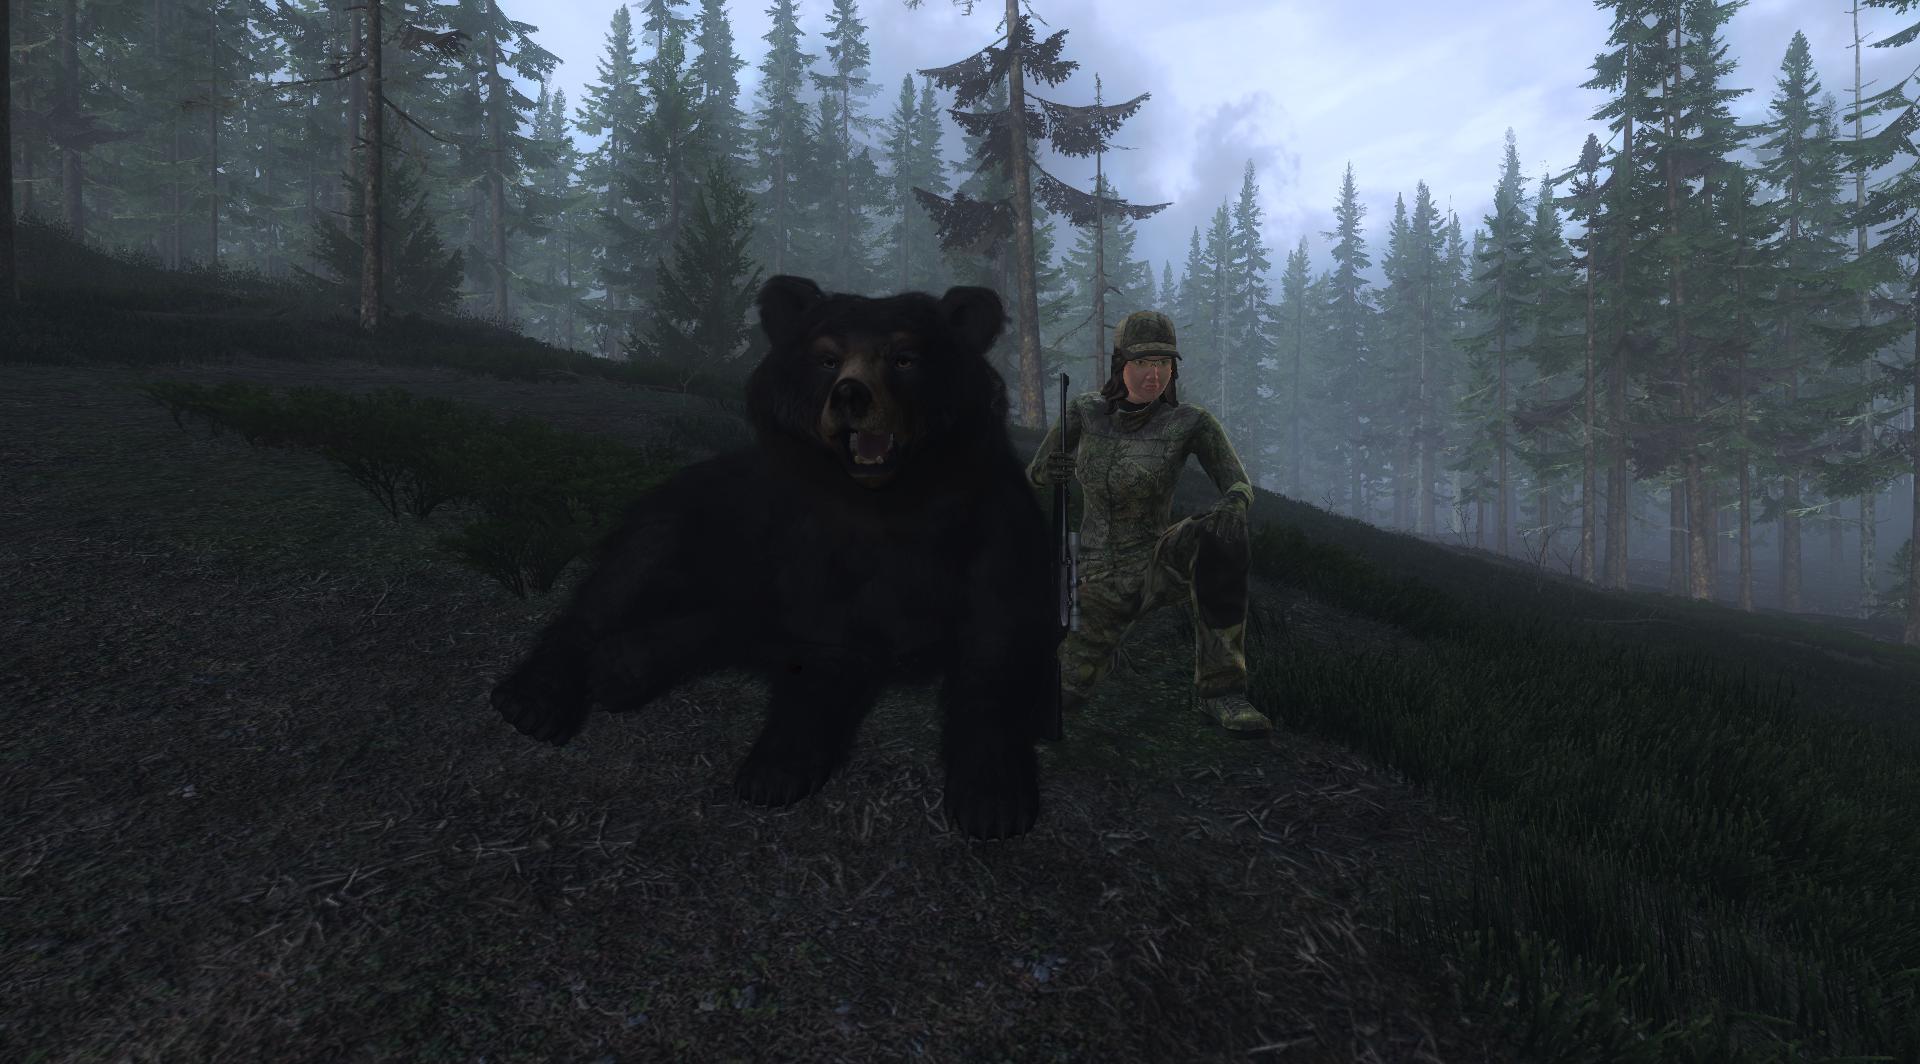 TOP 5 Black Bear // Oso Negro 1dbca23d726b14a8ff63561338231f120ef9b6c1